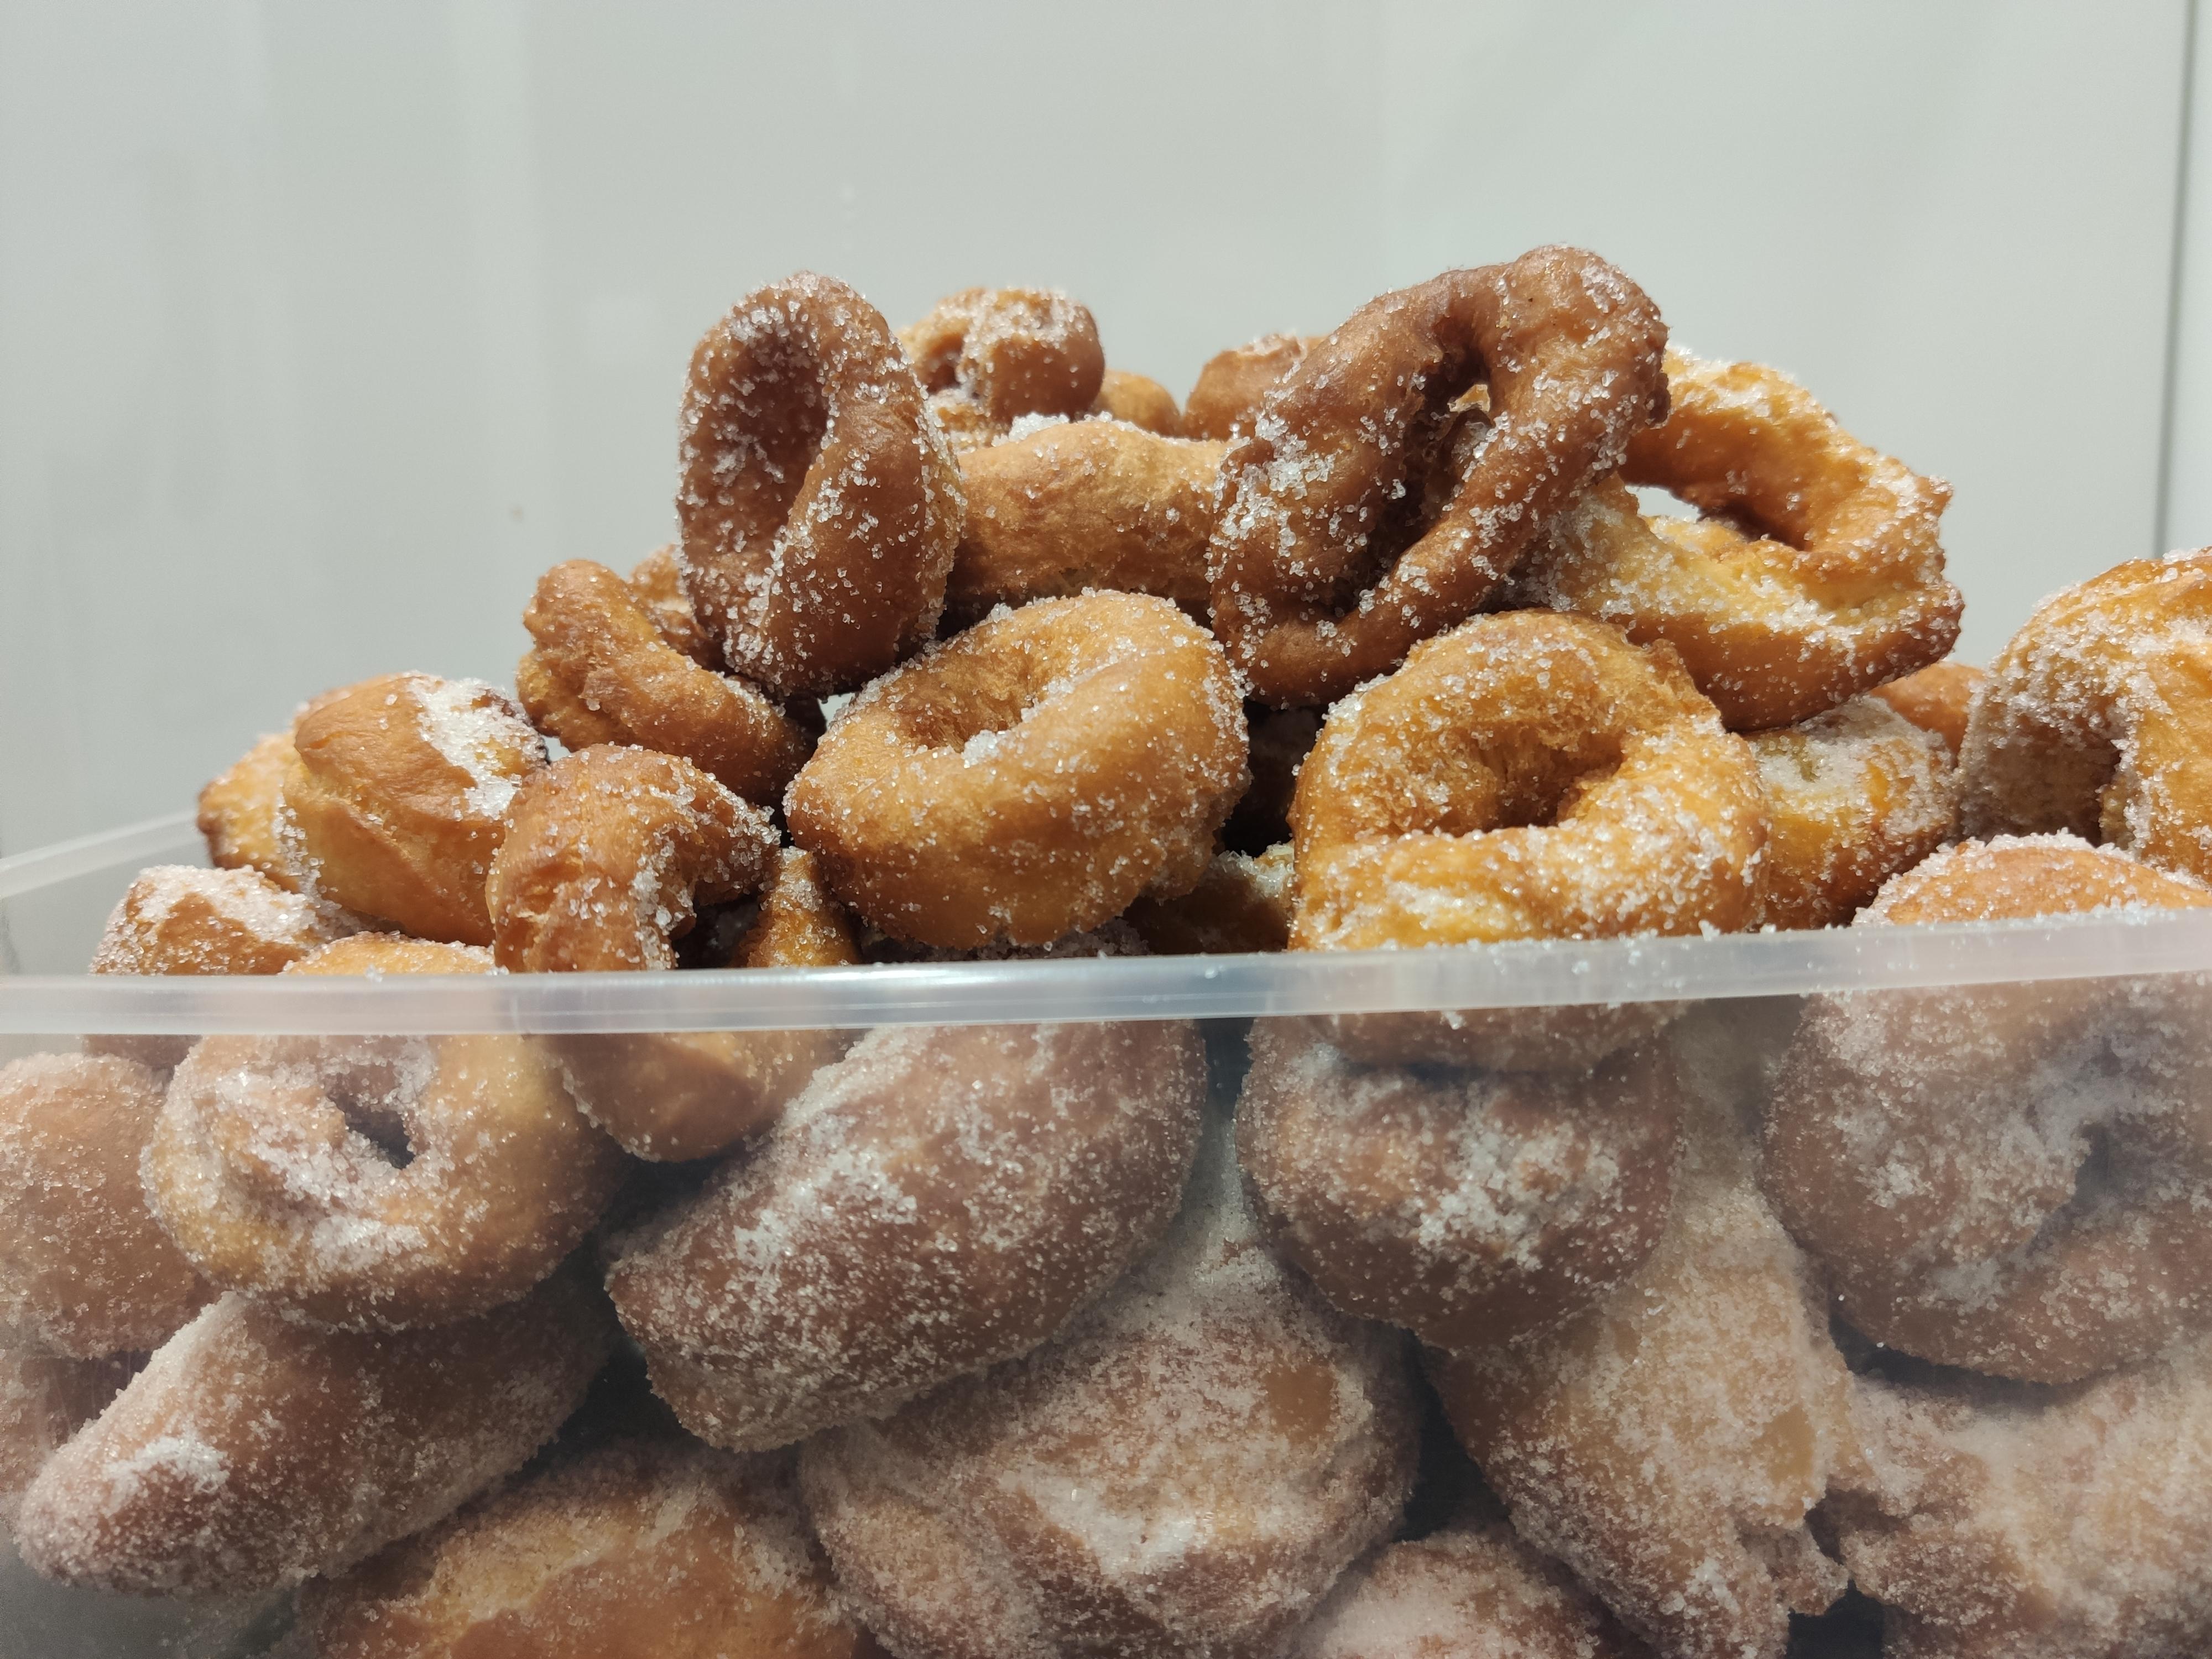 Receta roscos de naranja fritos de semana santa